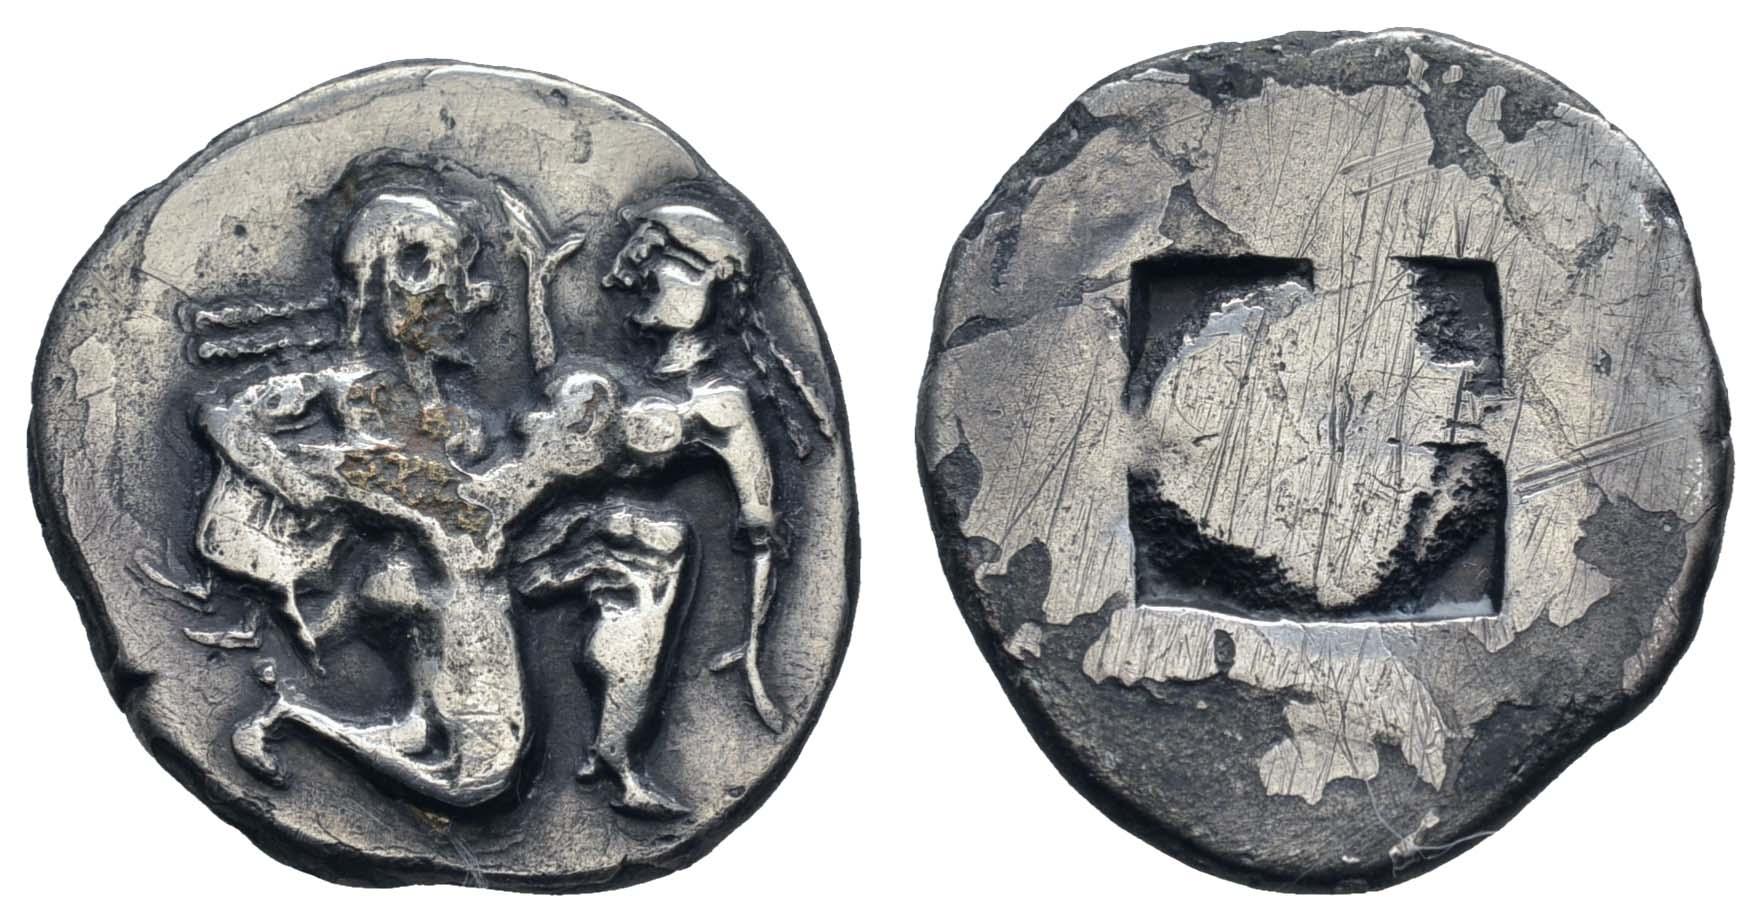 Lot 16 - Antike Griechen - Thracia -  Auktionshaus Ulrich Felzmann GmbH & Co. KG Coins single lots